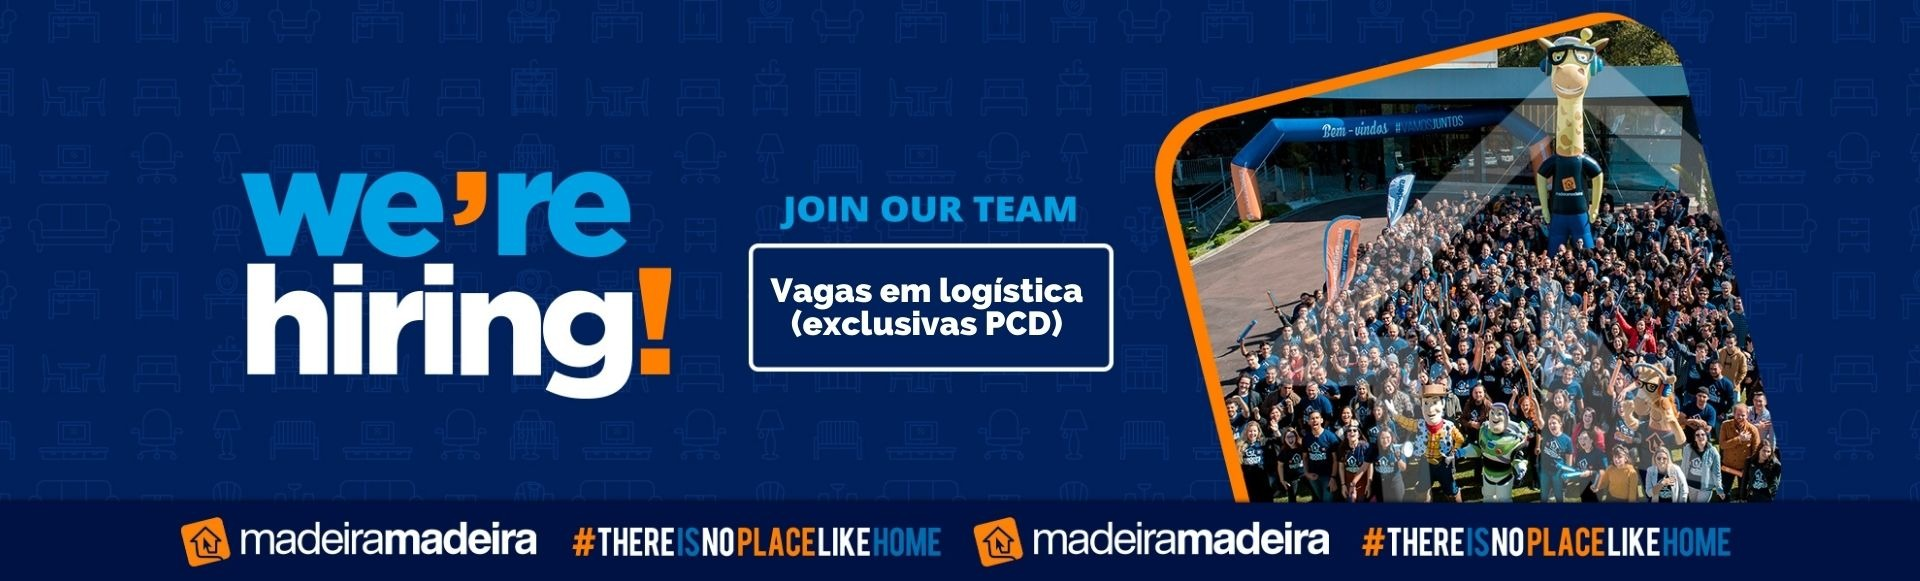 Vagas em logística - exclusivas PCD (Jundiaí-SP)